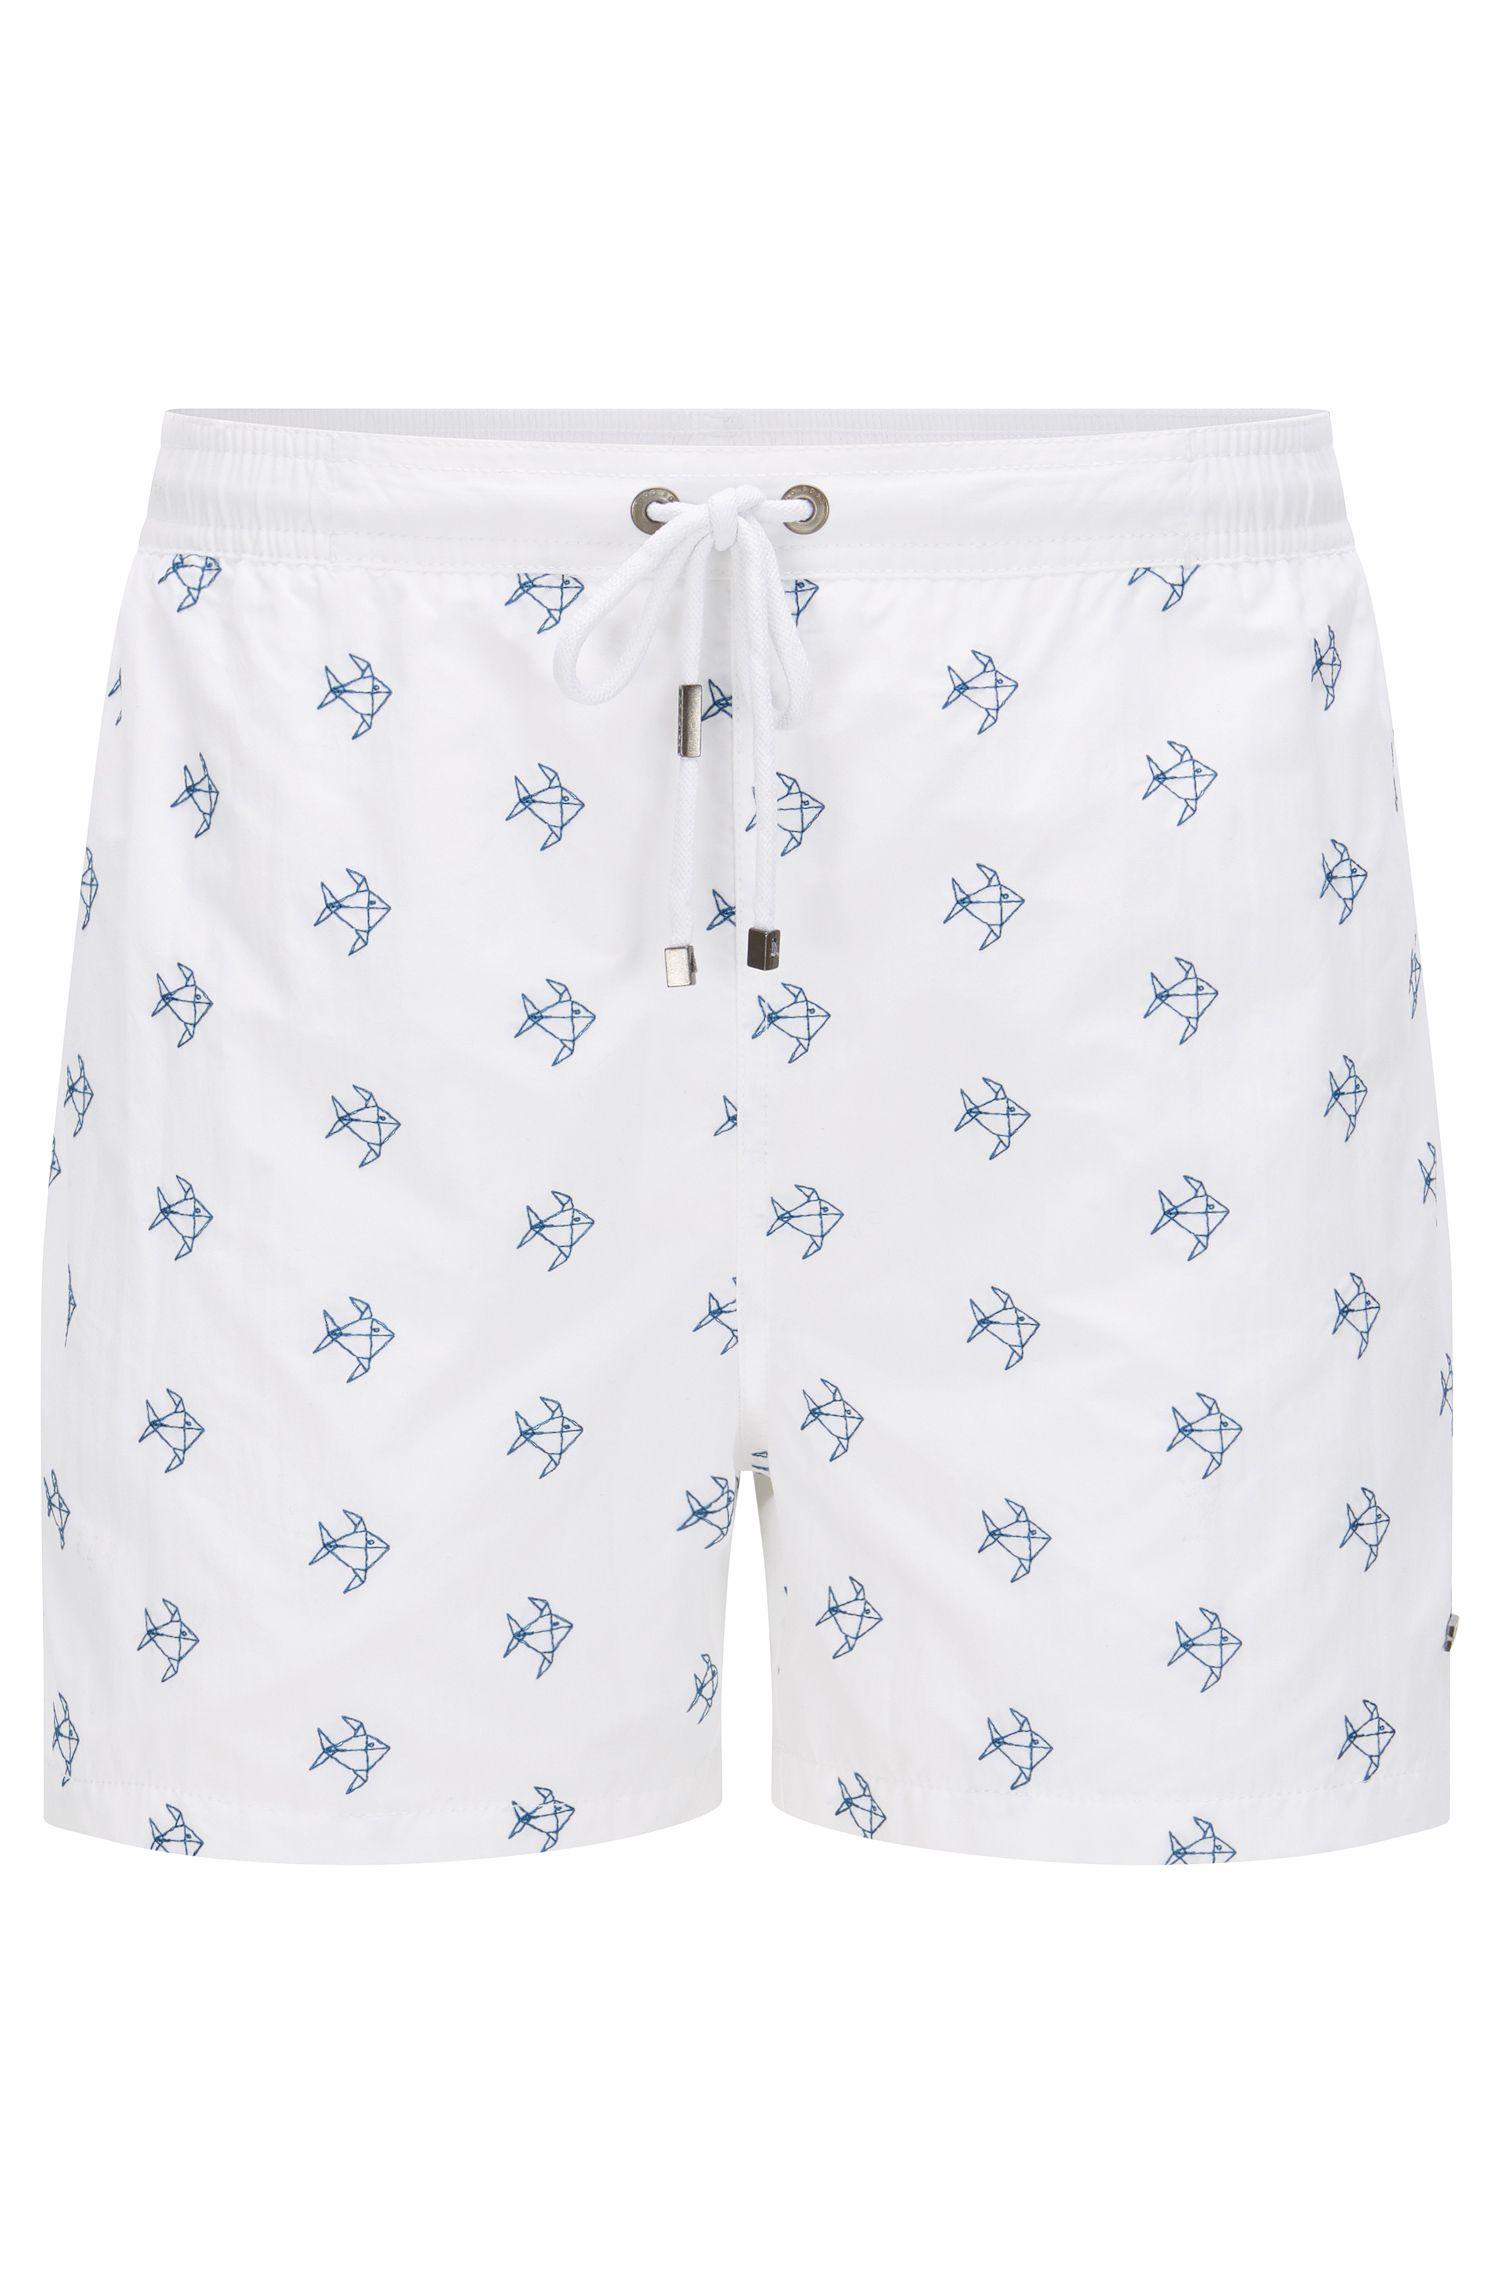 Quick Dry Nylon Embroidered Swim Short | White Shark